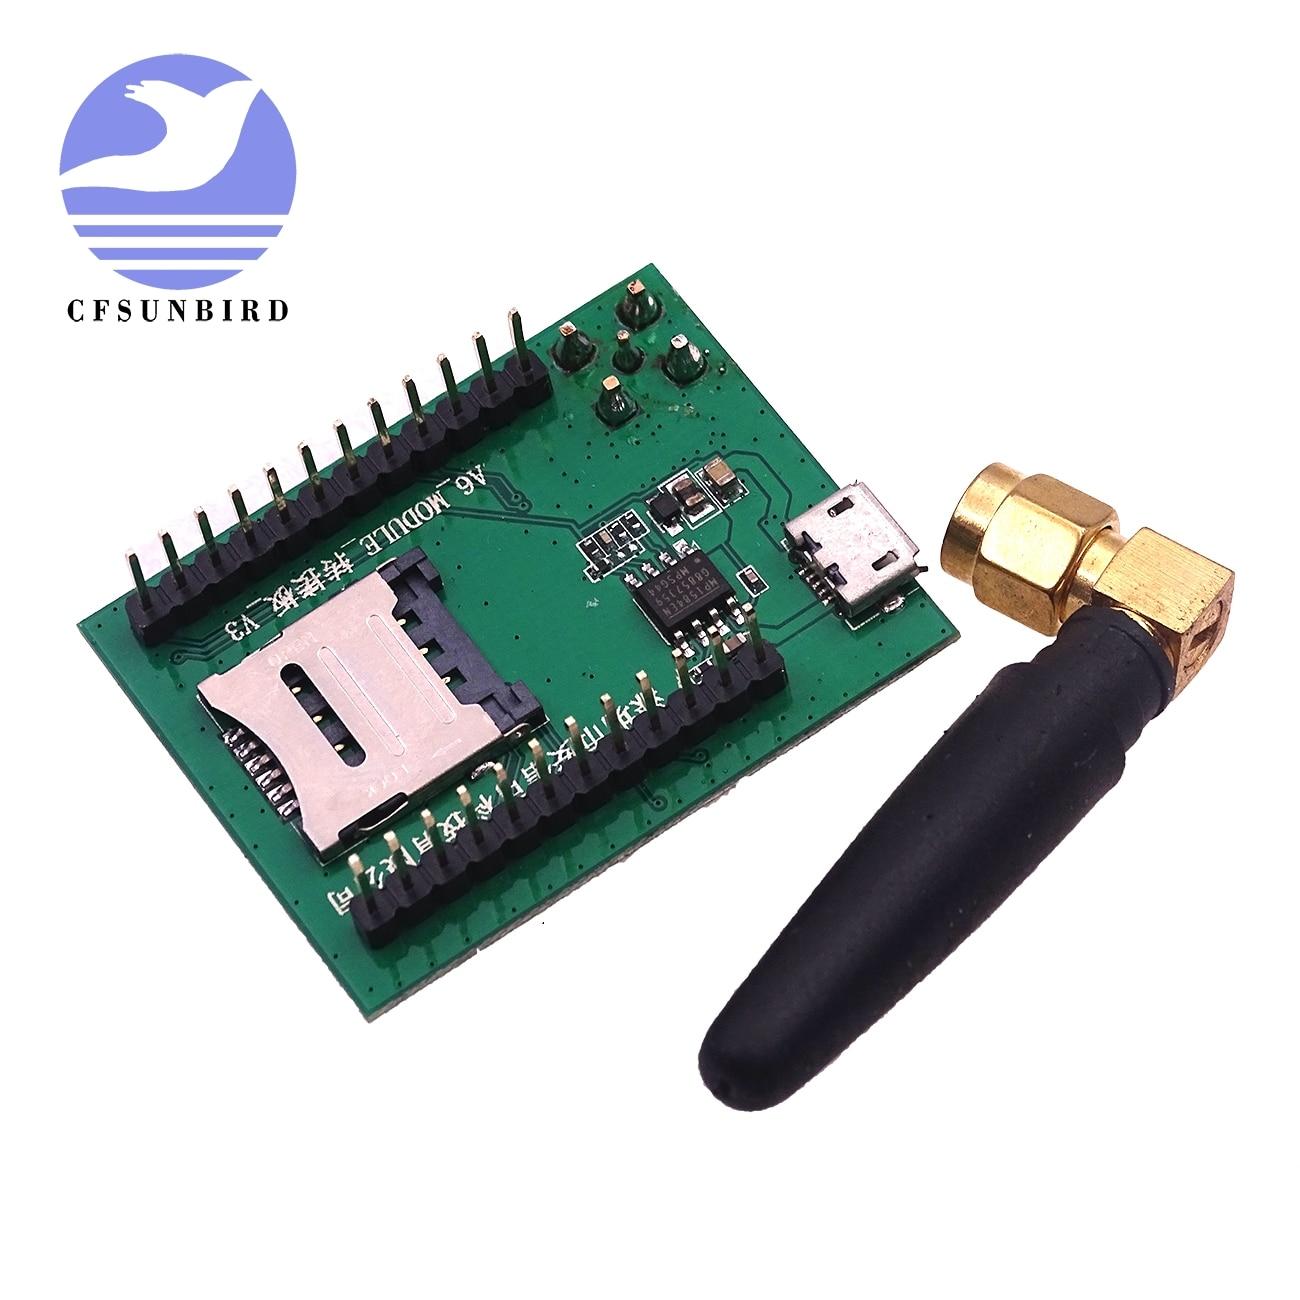 US $4 94 20% OFF|1Pcs/Lot ESP8266 Smart Electronics Gsm a6 GPRS Module GSM  Module A6 \ SMS \ Speech \ Board \ Wireless Data Trans Adapter Plate-in